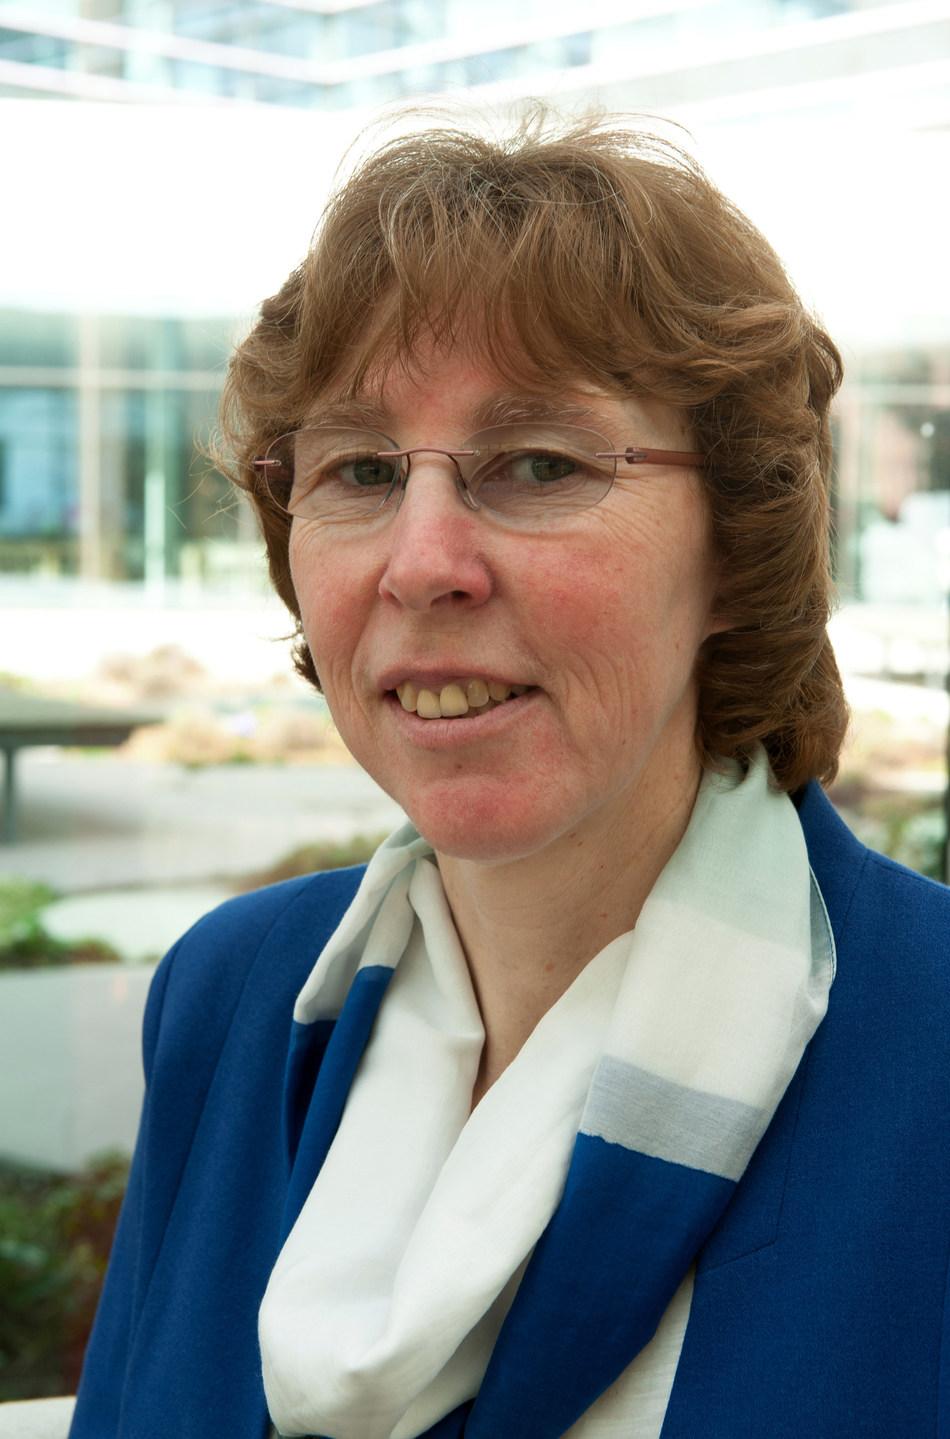 Susanne Gronen, senior vice president and Head of Data Sciences, Astellas